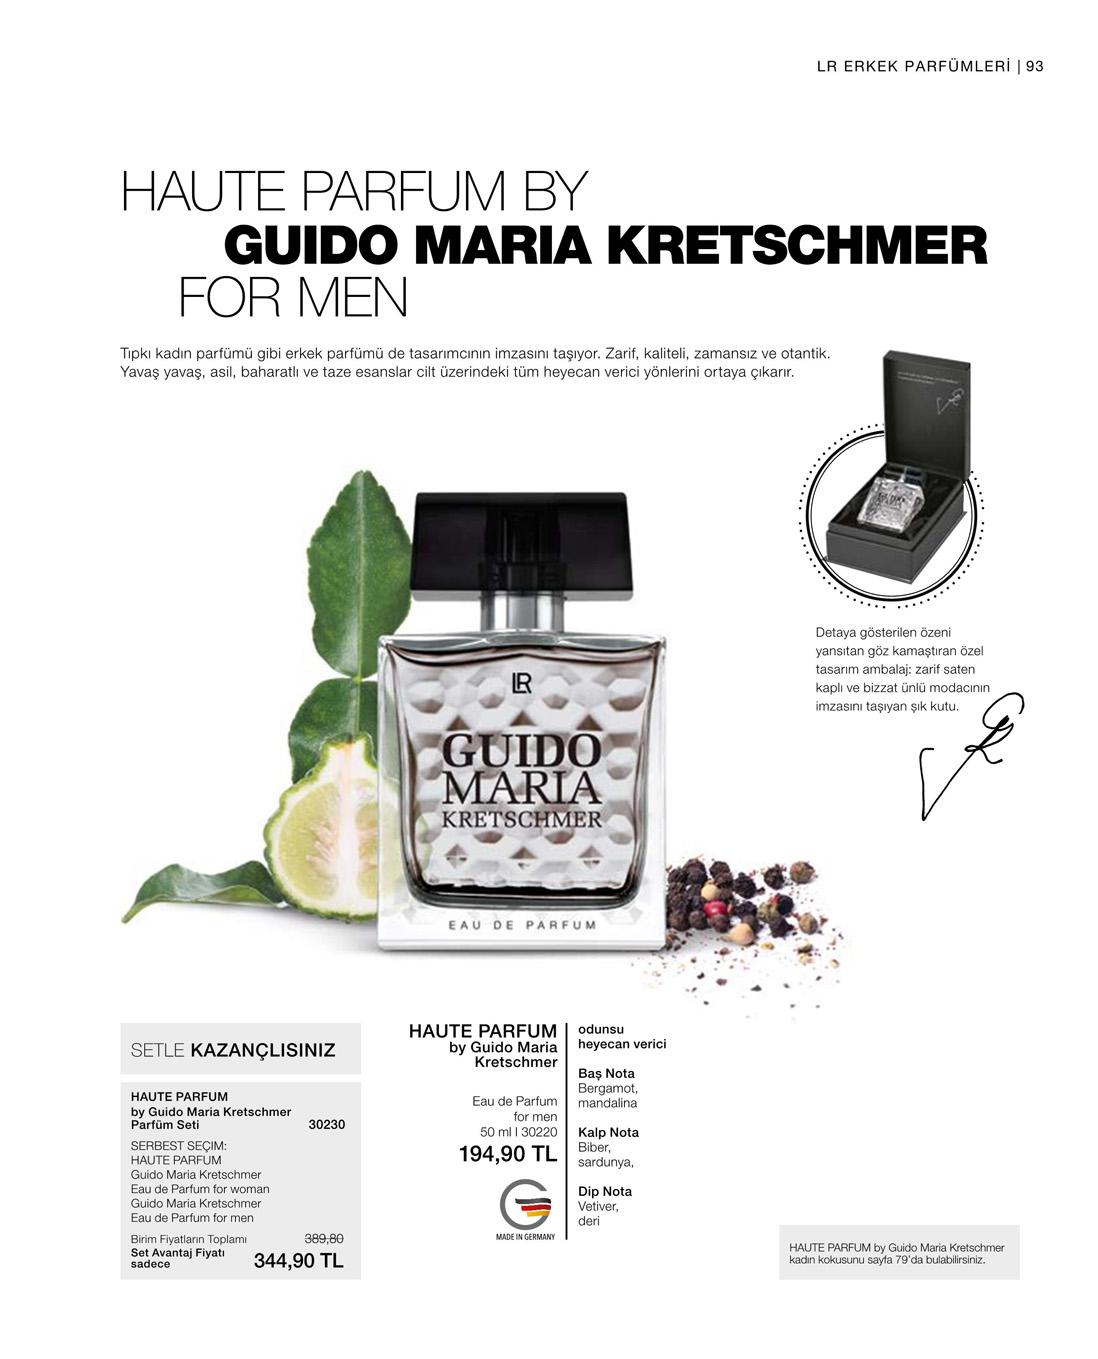 LR Guido Maria Kretschmer EdP for Men katalog